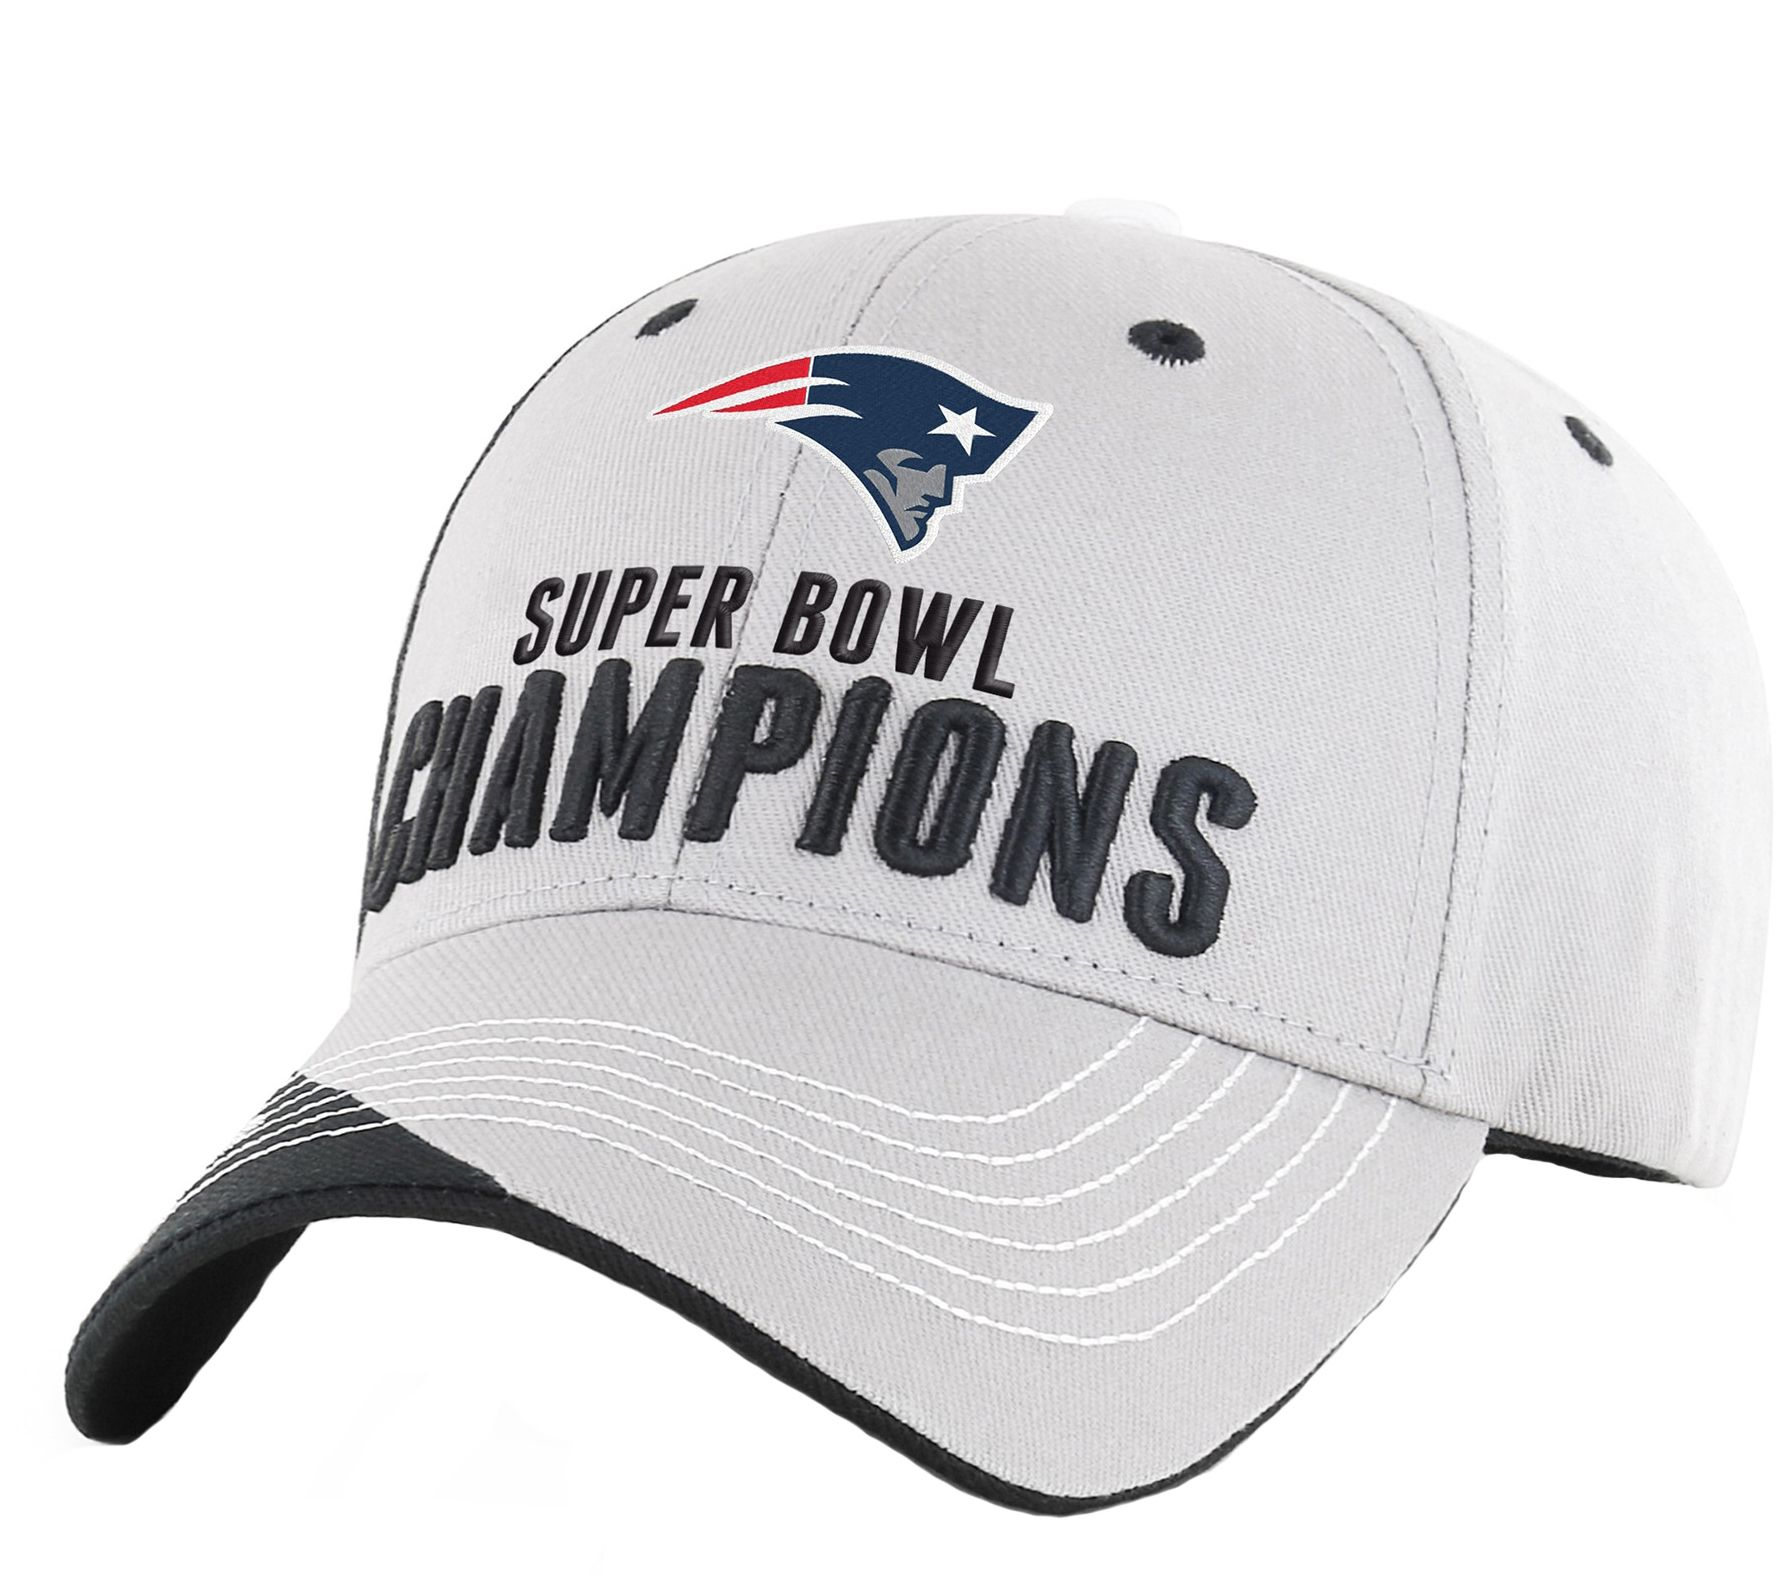 buy popular 3c74e af5d0 NFL Super Bowl LIII Champ PatriotsHubris Hat - Page 1 — QVC.com